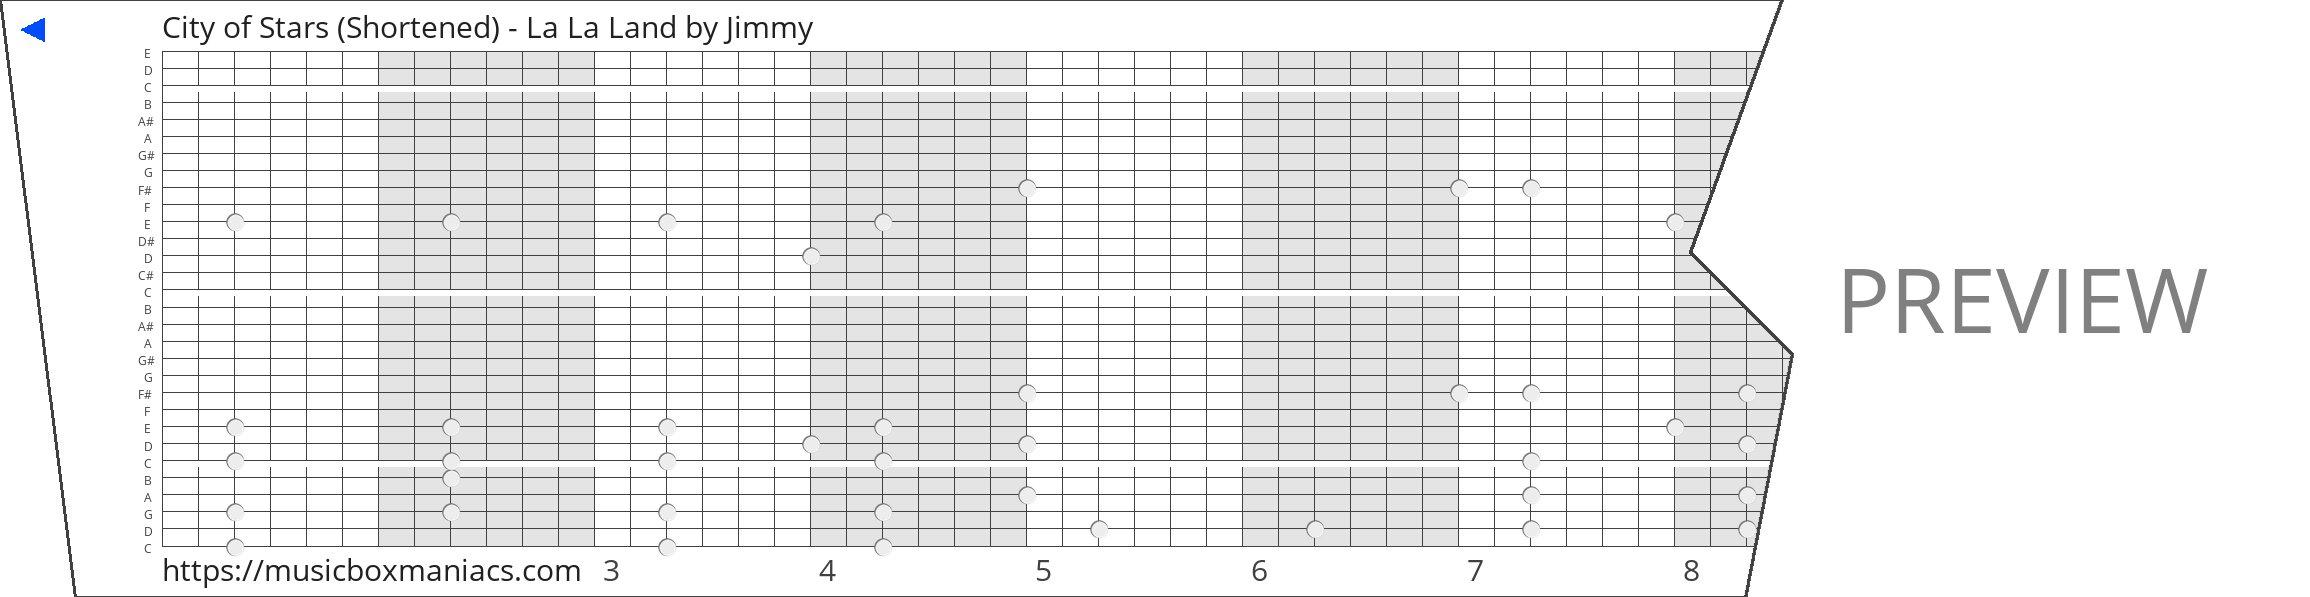 City of Stars (Shortened) - La La Land 30 note music box paper strip